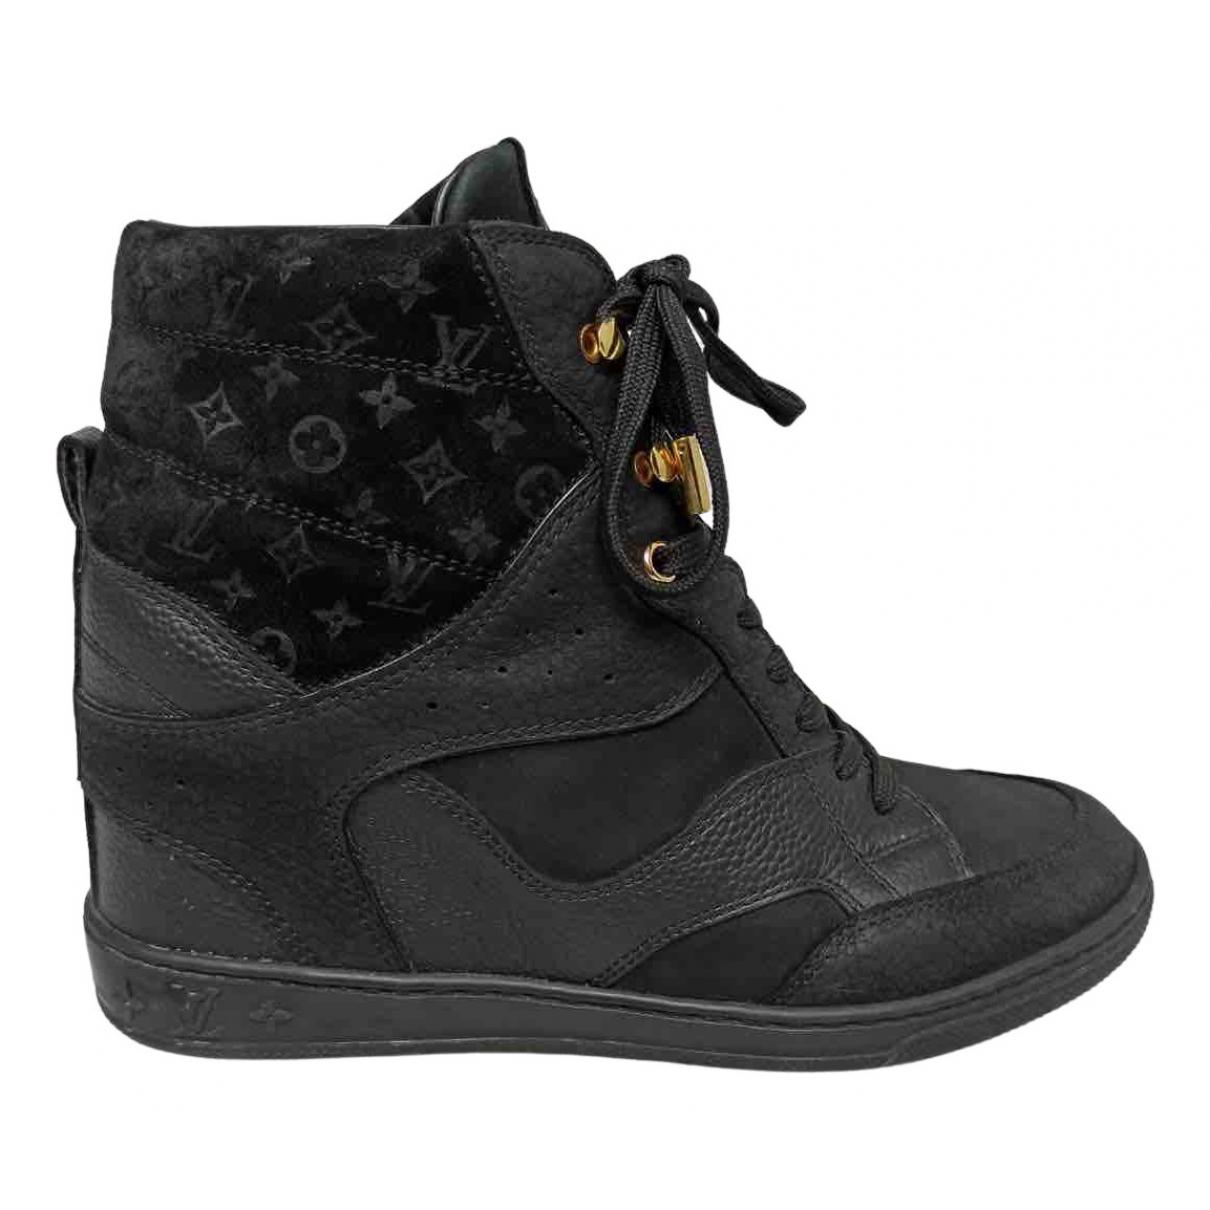 Louis Vuitton N Black Leather Trainers for Women 37 EU